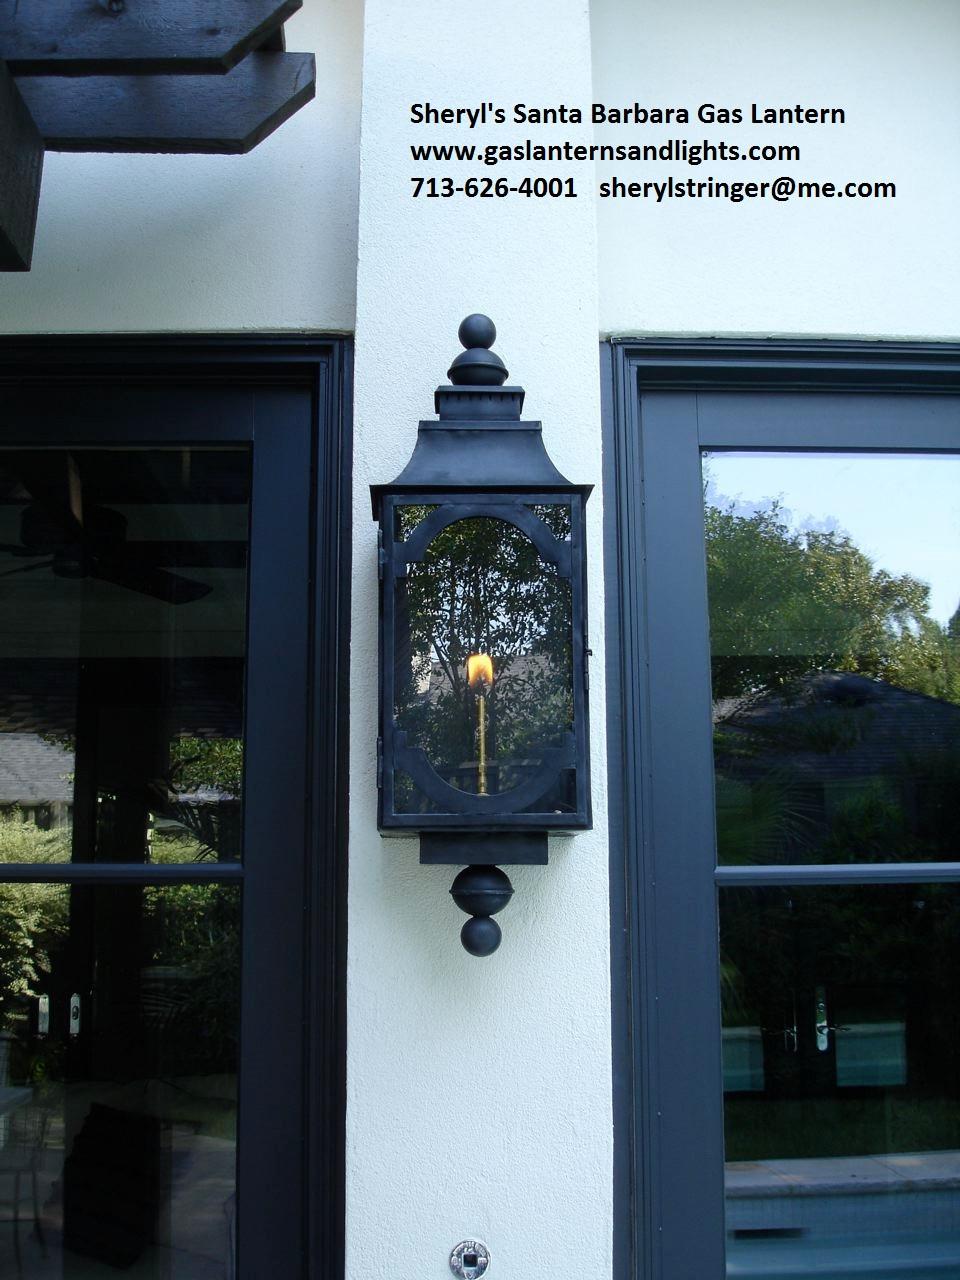 Sheryl's Santa Barbara Gas Lanterns